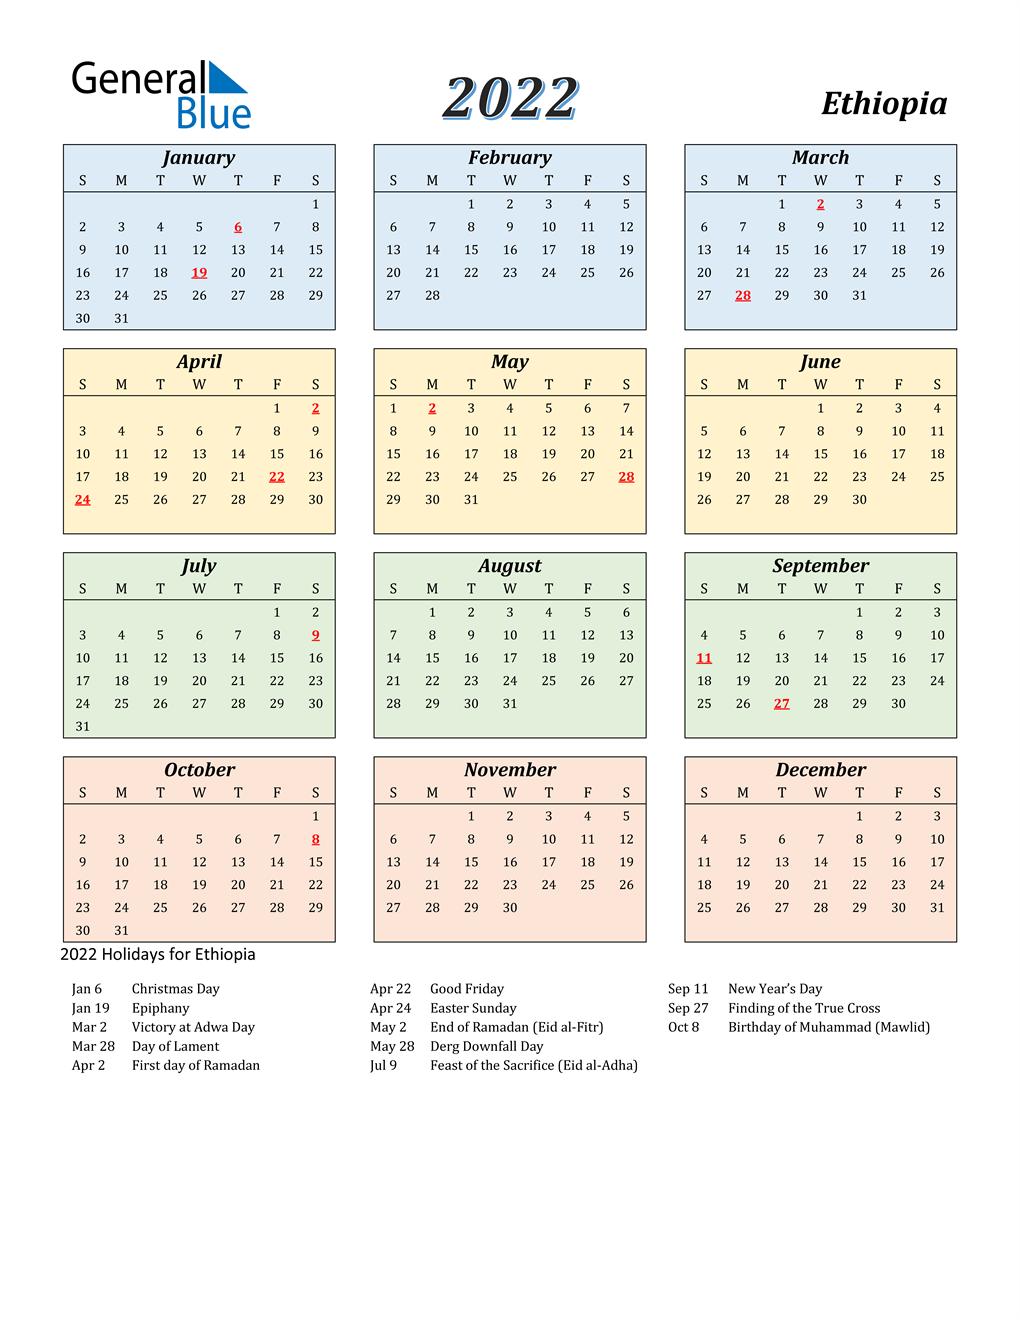 Ethiopian Fasting Calendar 2022.2022 Ethiopia Calendar With Holidays